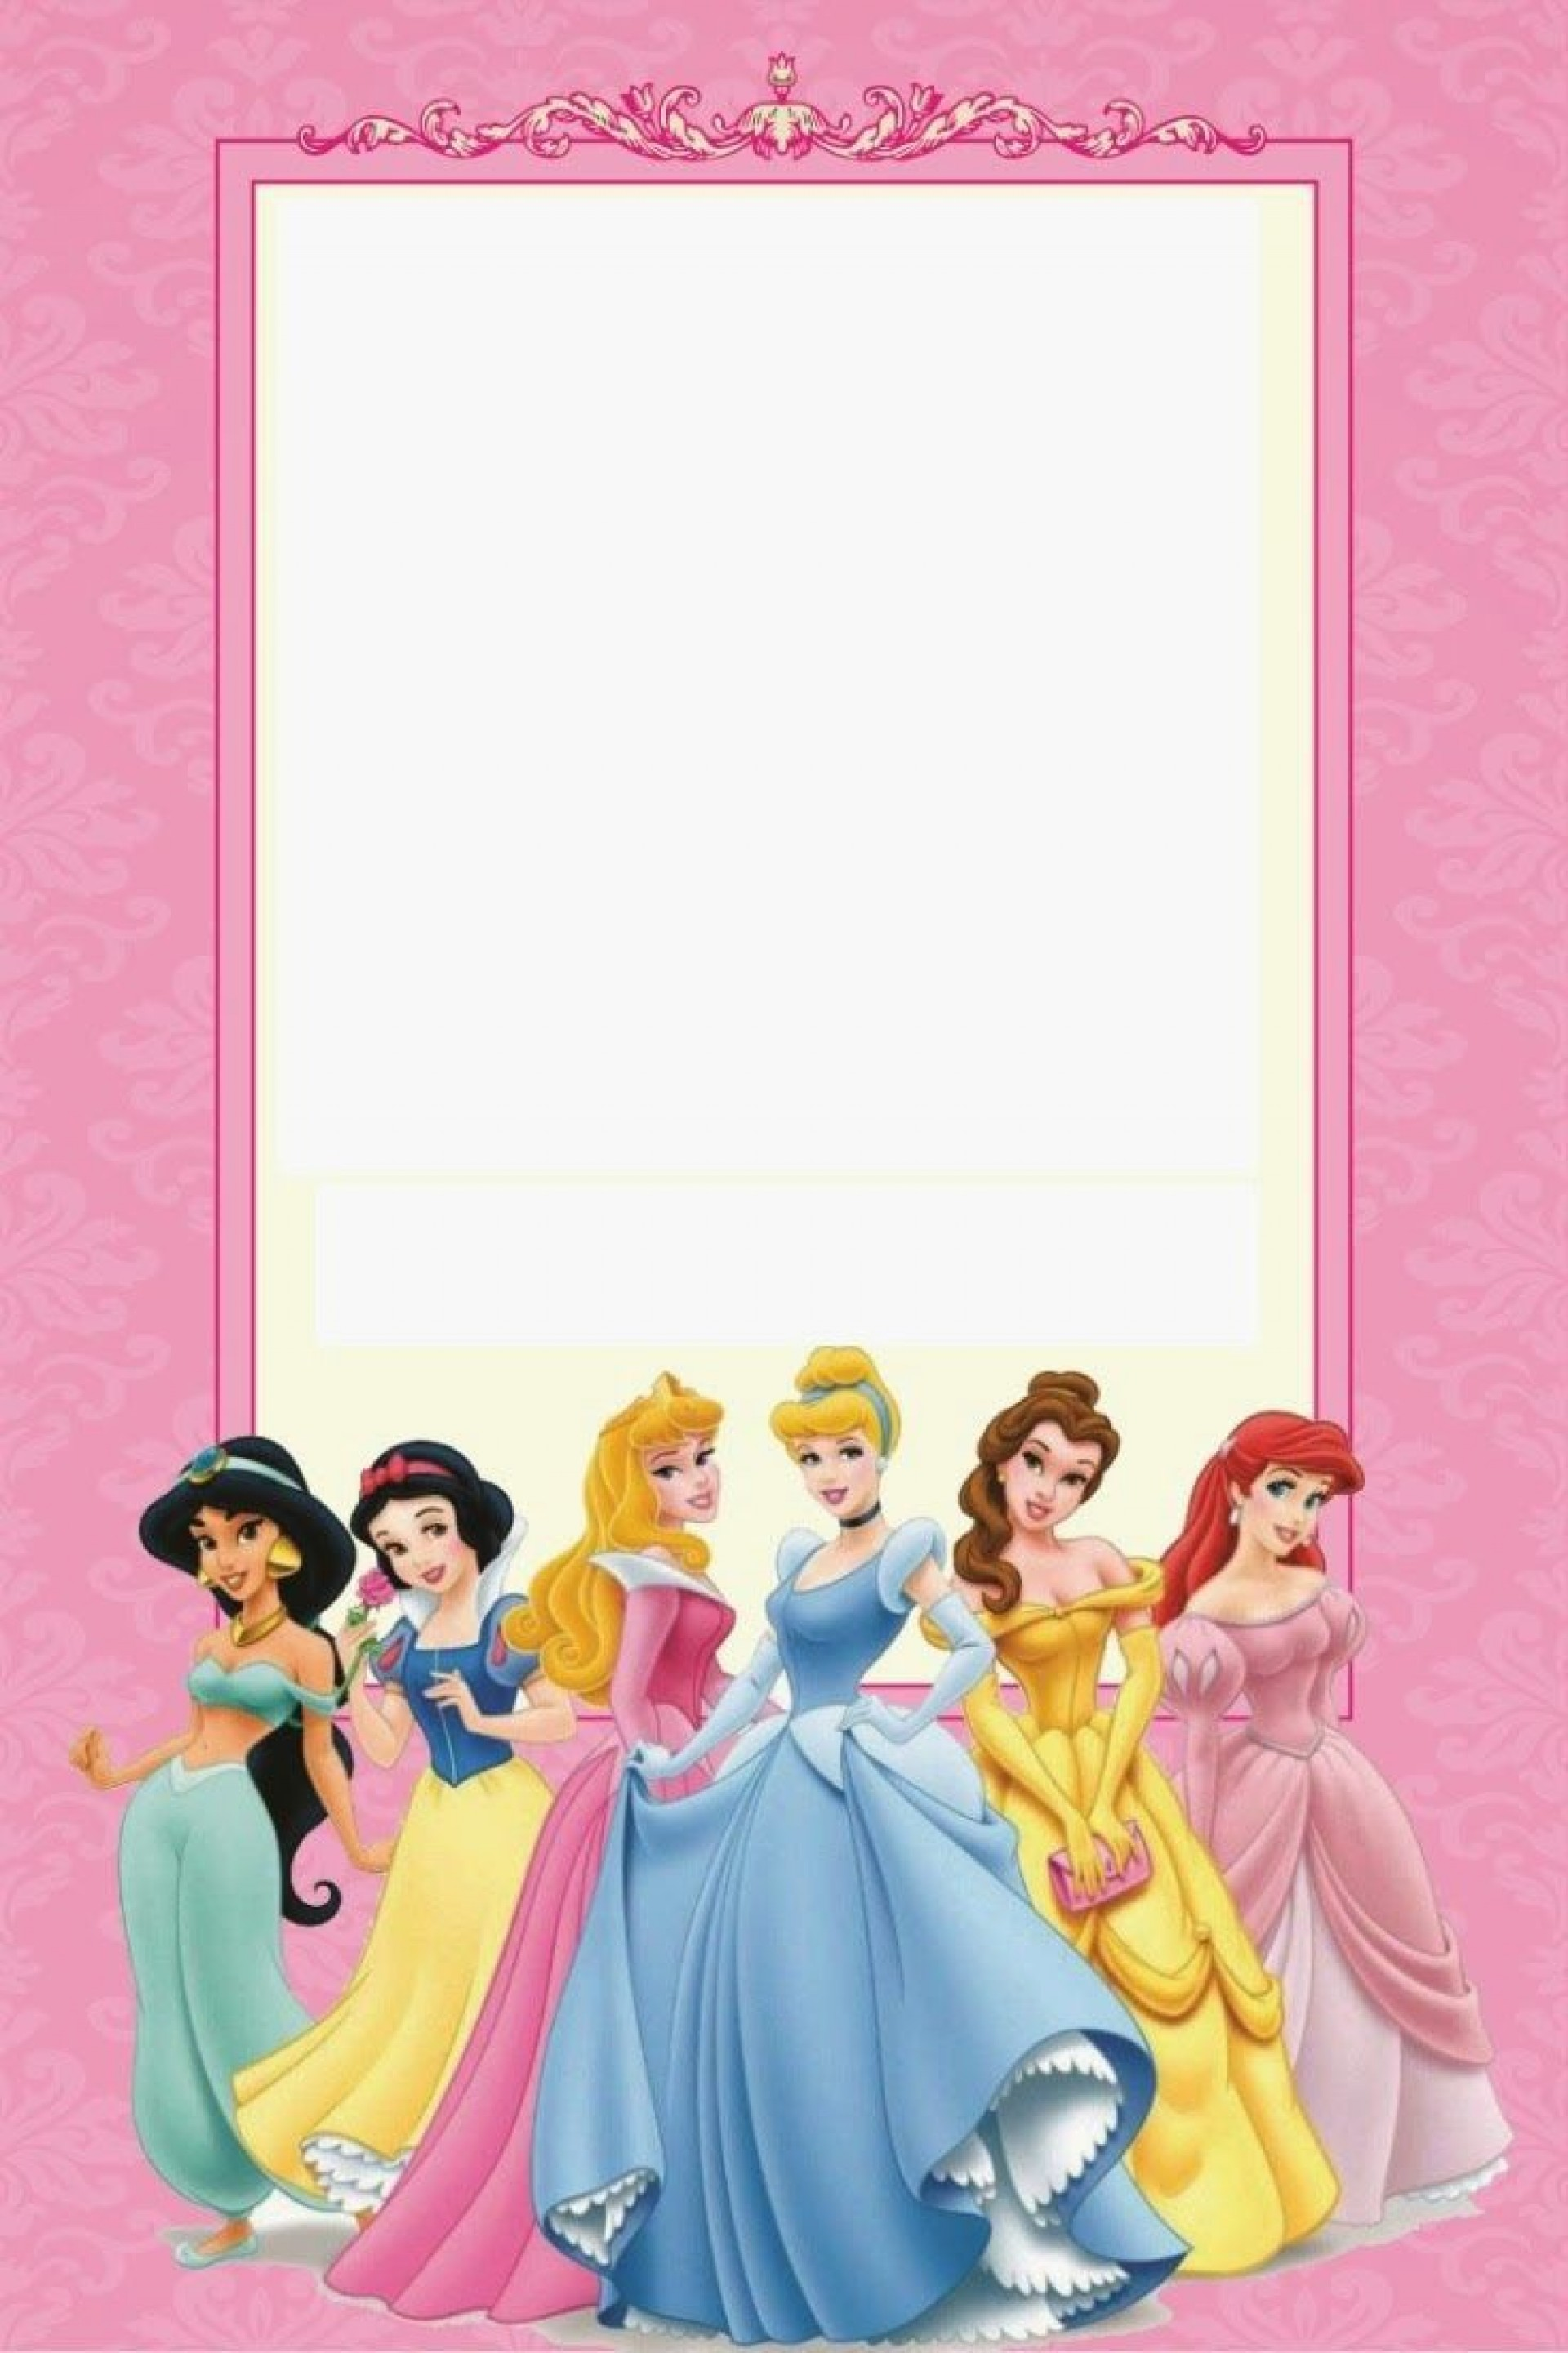 009 Marvelou Disney Princes Invitation Template Example  Downloadable Party Free Printable Birthday1920